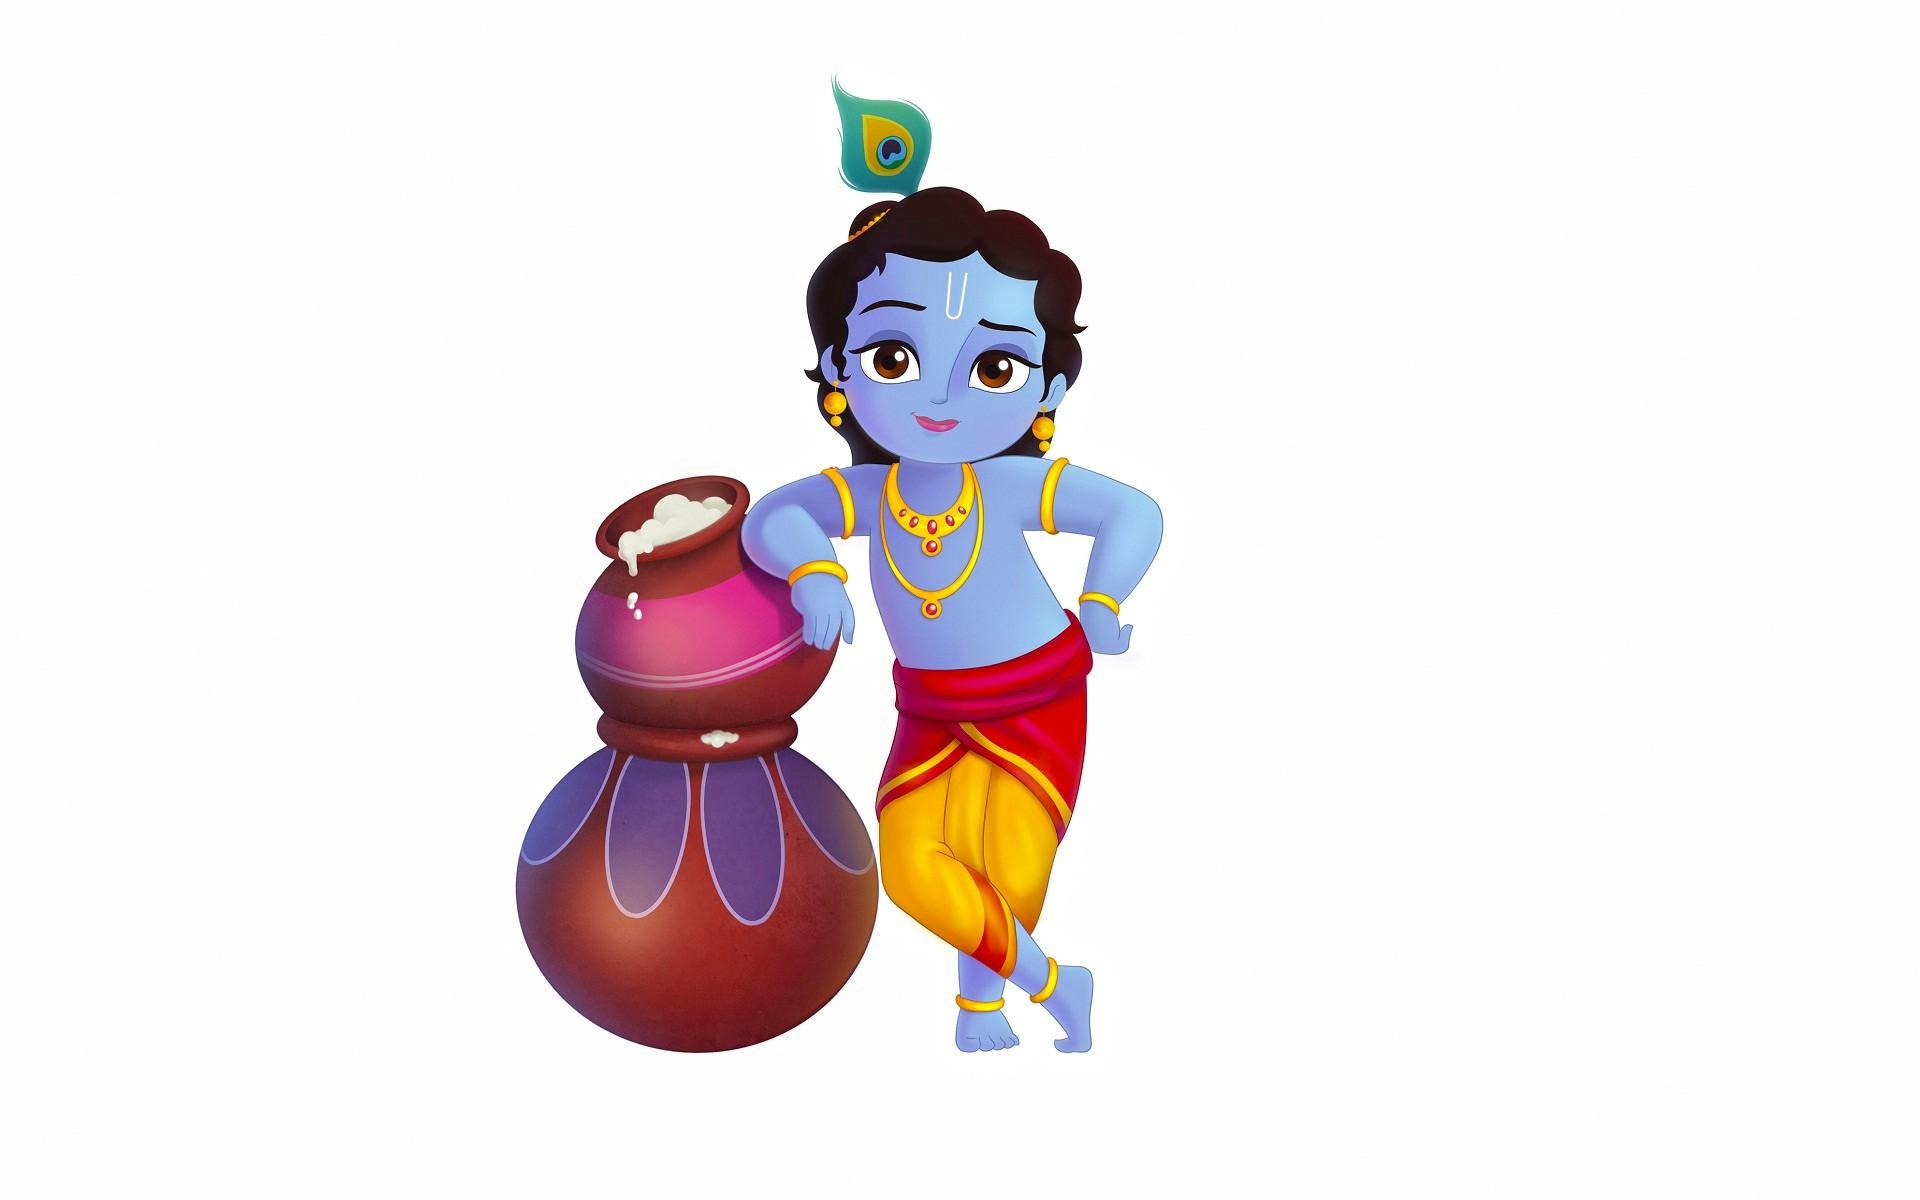 Wiki Shree Krishna Animation Wallpaper Pic Wpe0012387 - Shri Krishna Image Cartoon - HD Wallpaper